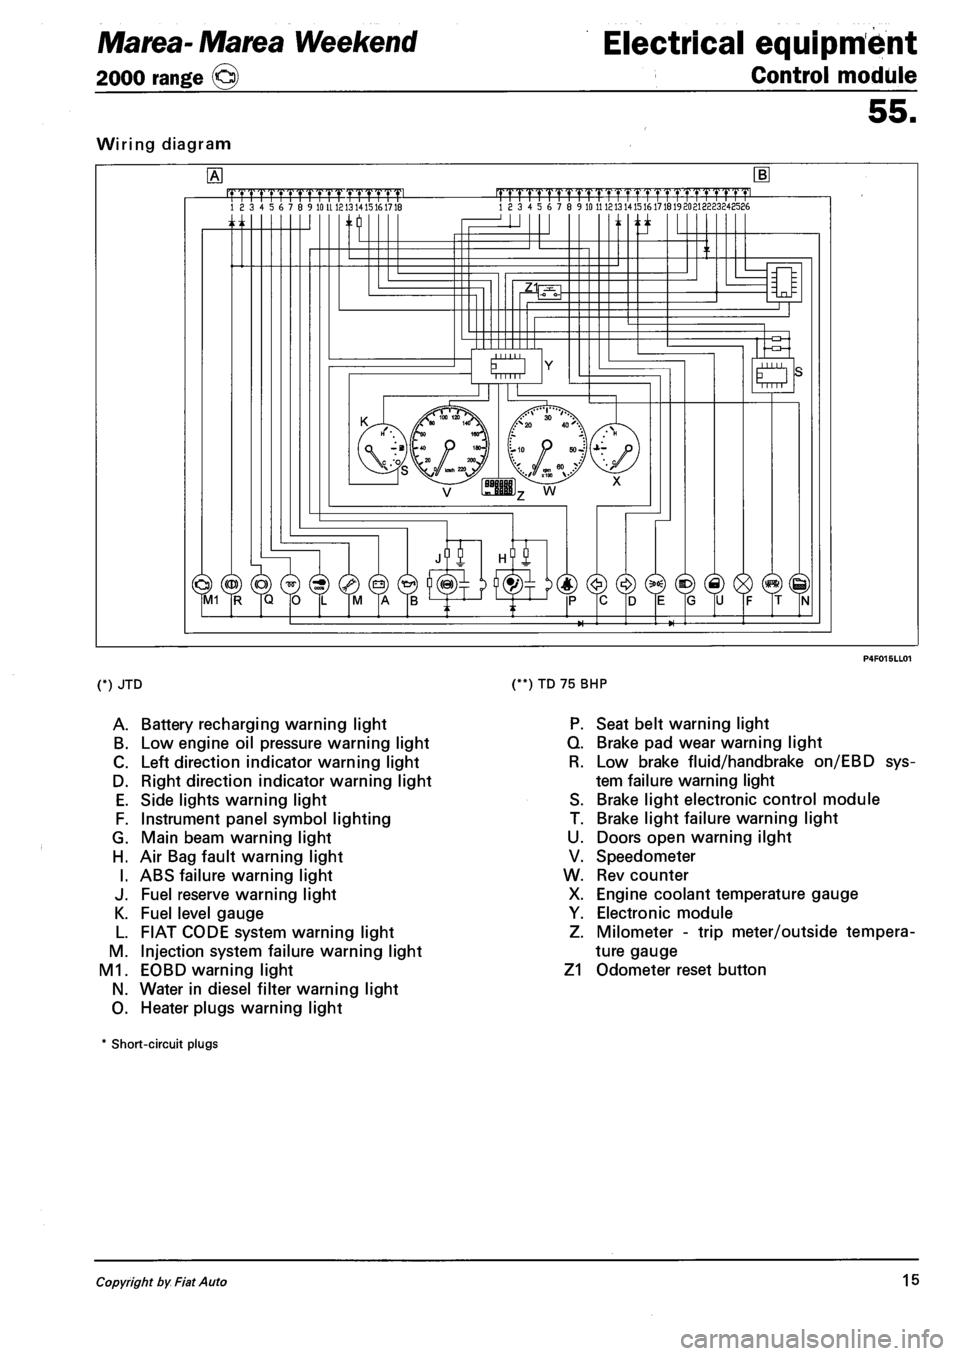 medium resolution of fiat palio weekend wiring diagram wiring library source oil filter fiat marea 2000 workshop manual